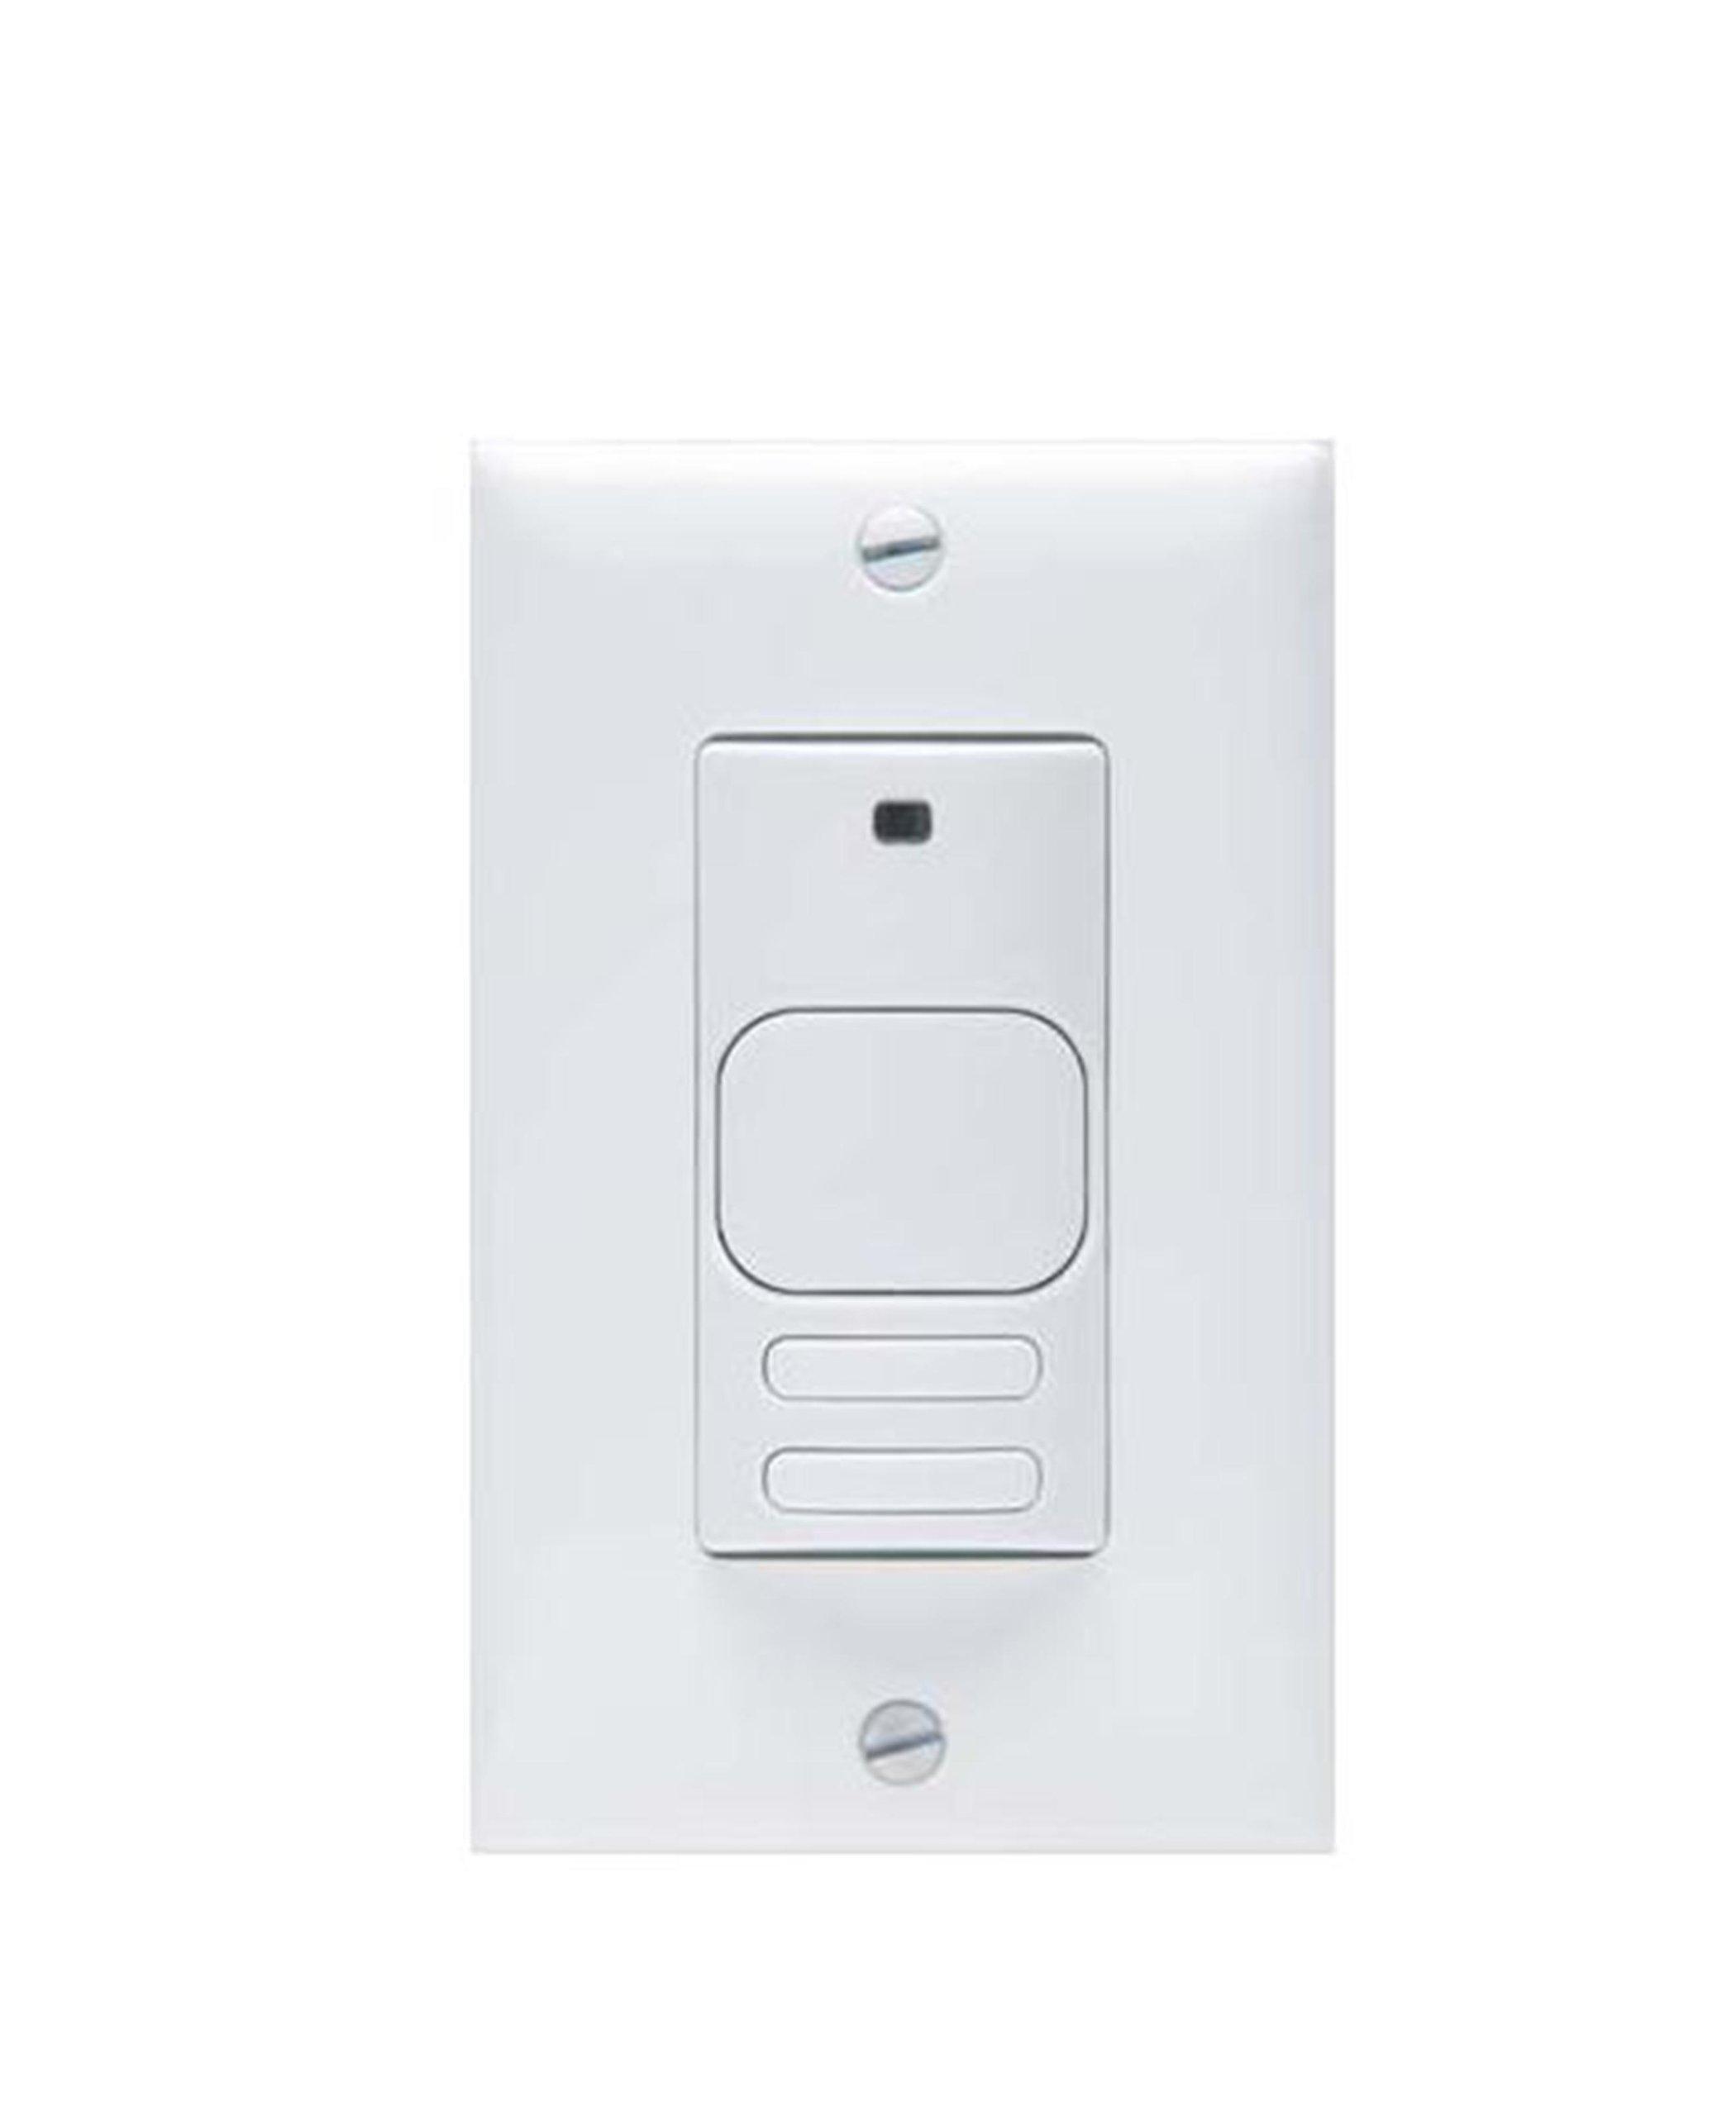 Buy Hubbell Building Automation LightHAWK LHIRD2W Digital Infrared ...